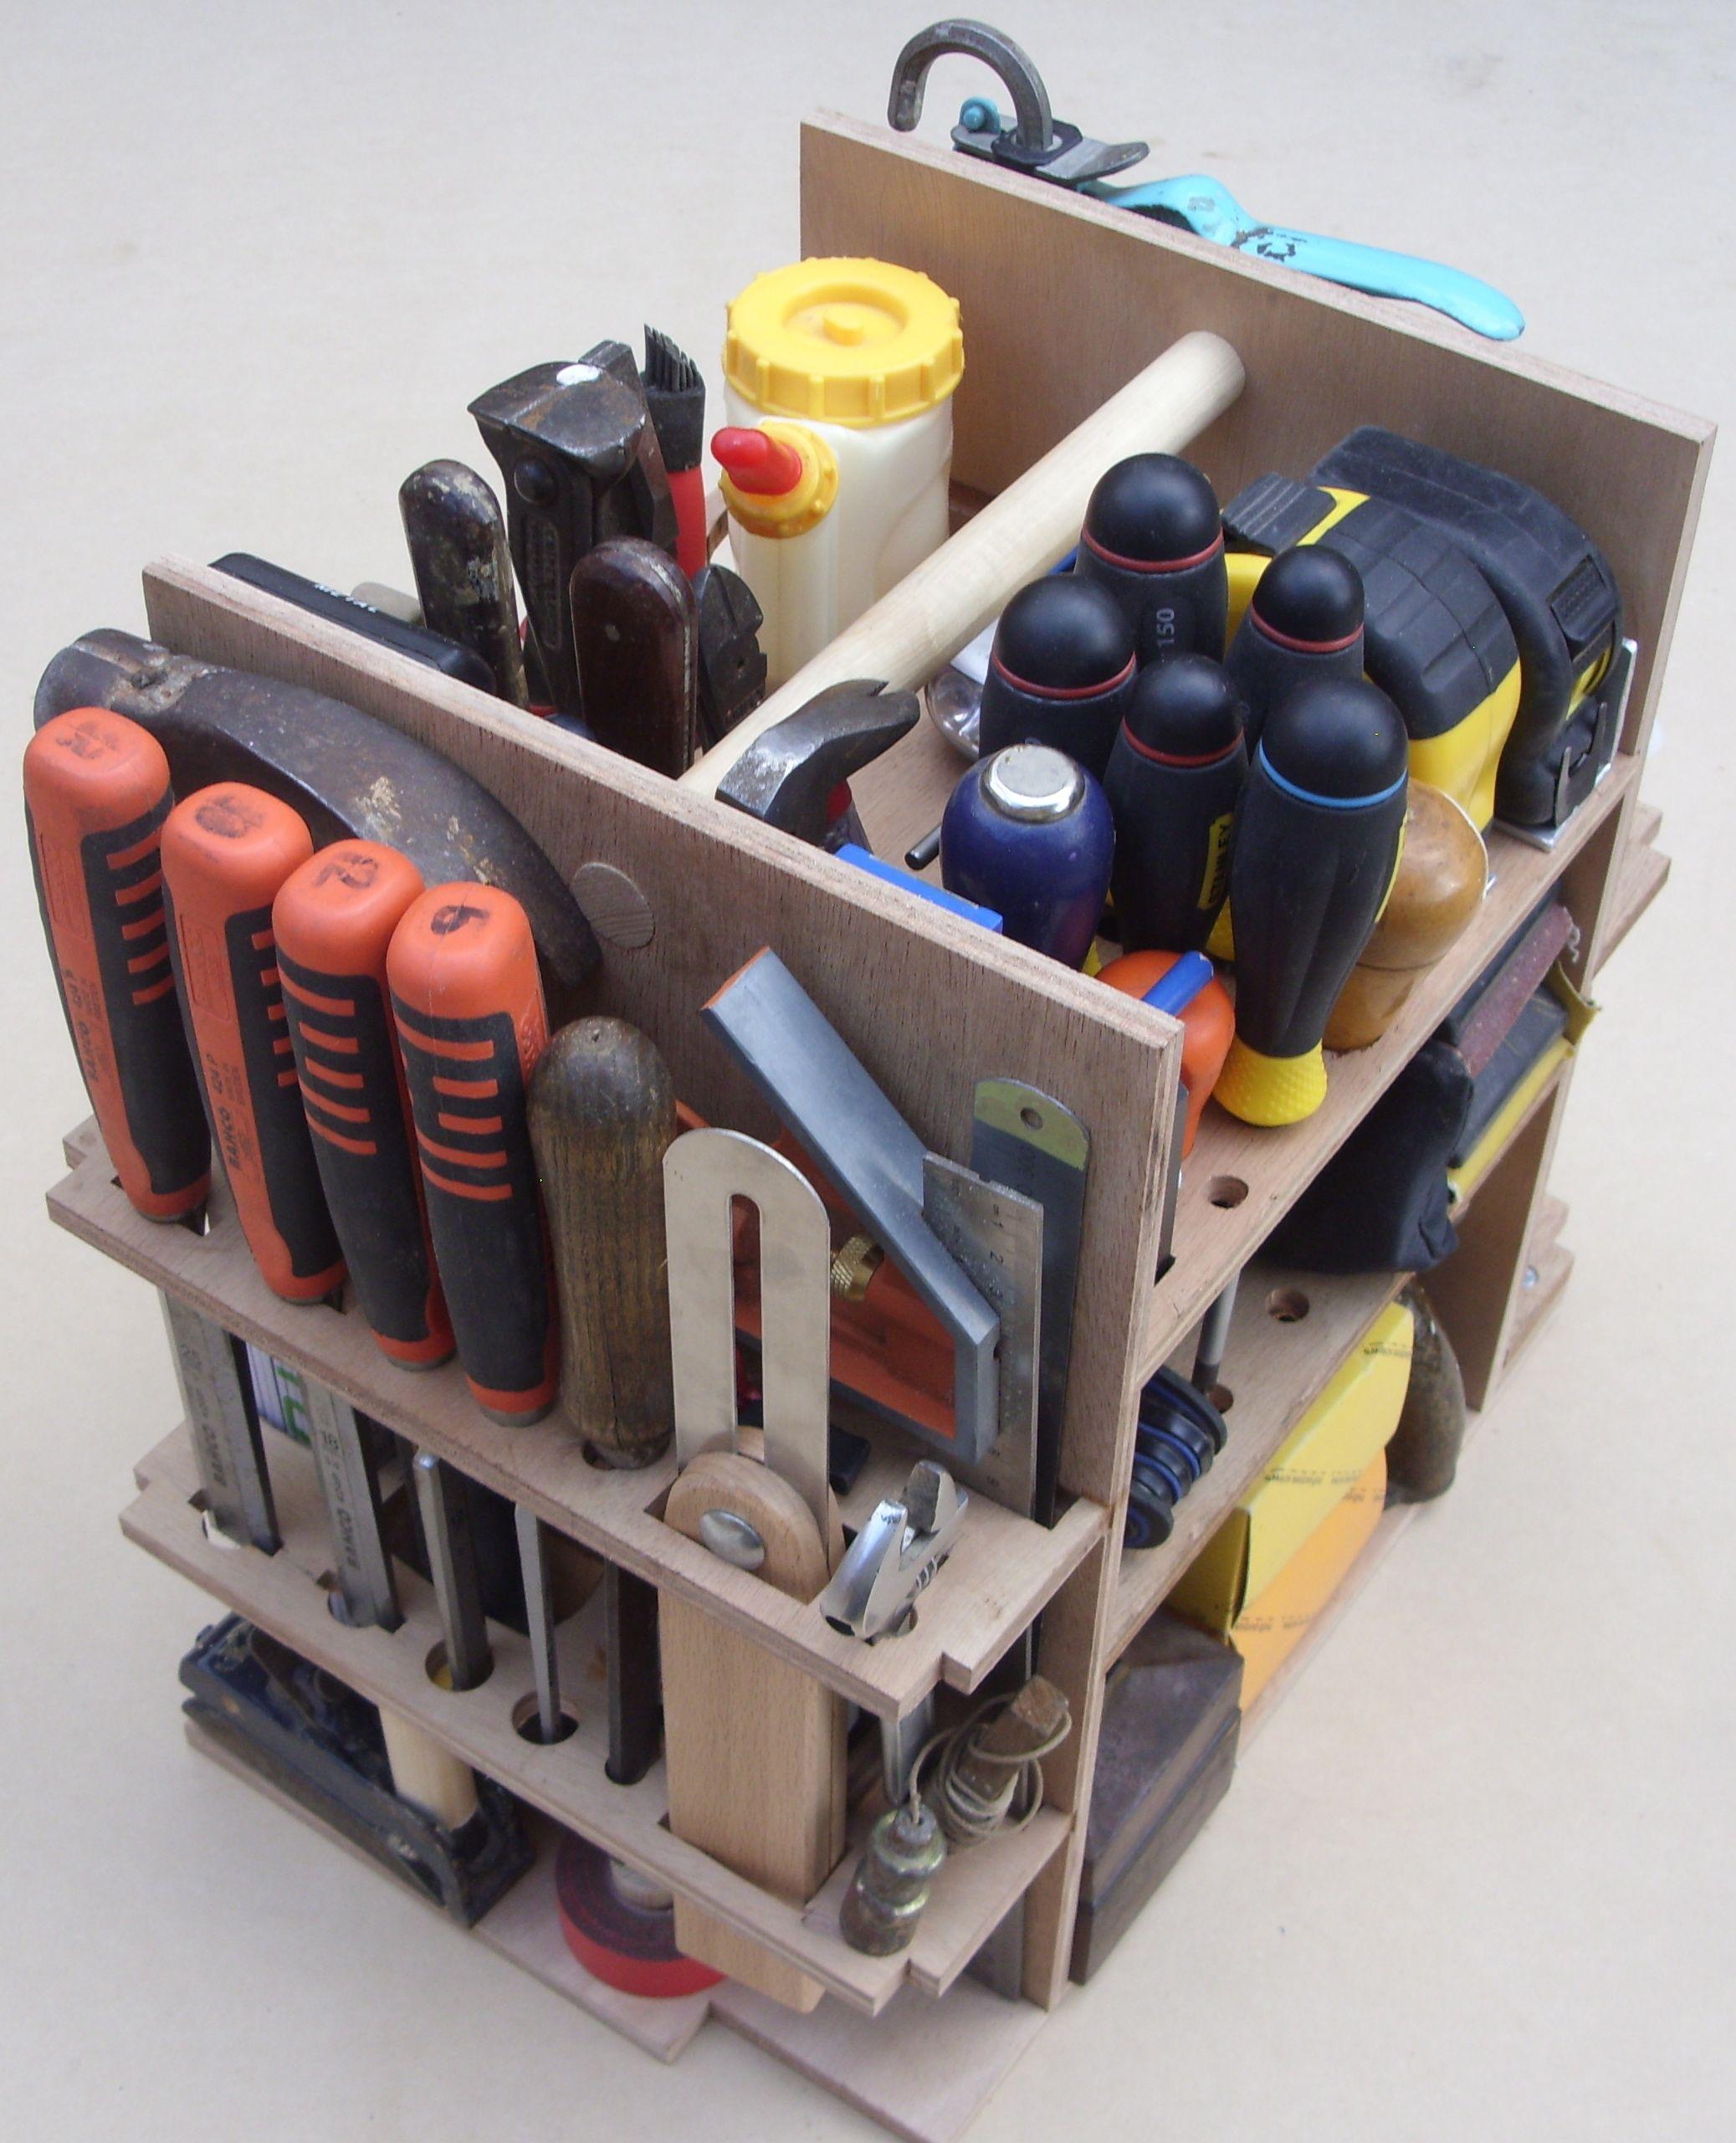 sys-5 tool caddy | workshop | garage tools, diy tools